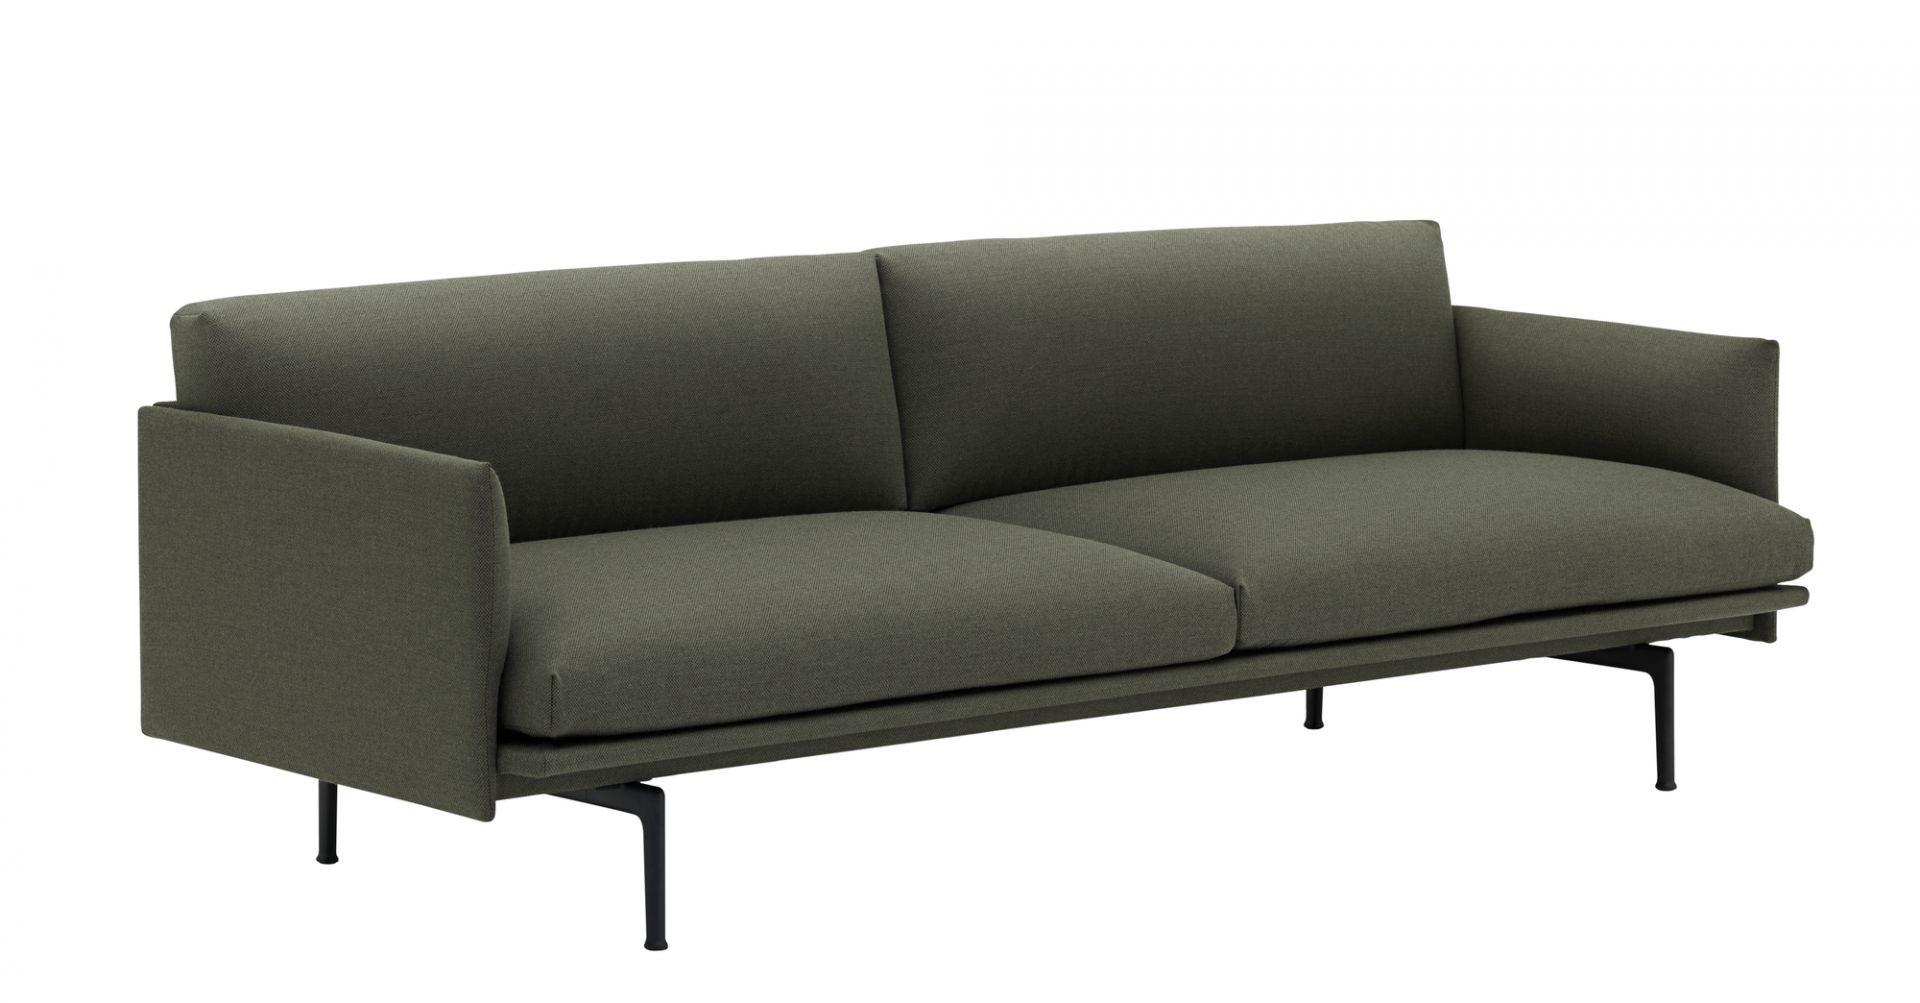 Outline 3-Seater Sofa Black Base Muuto